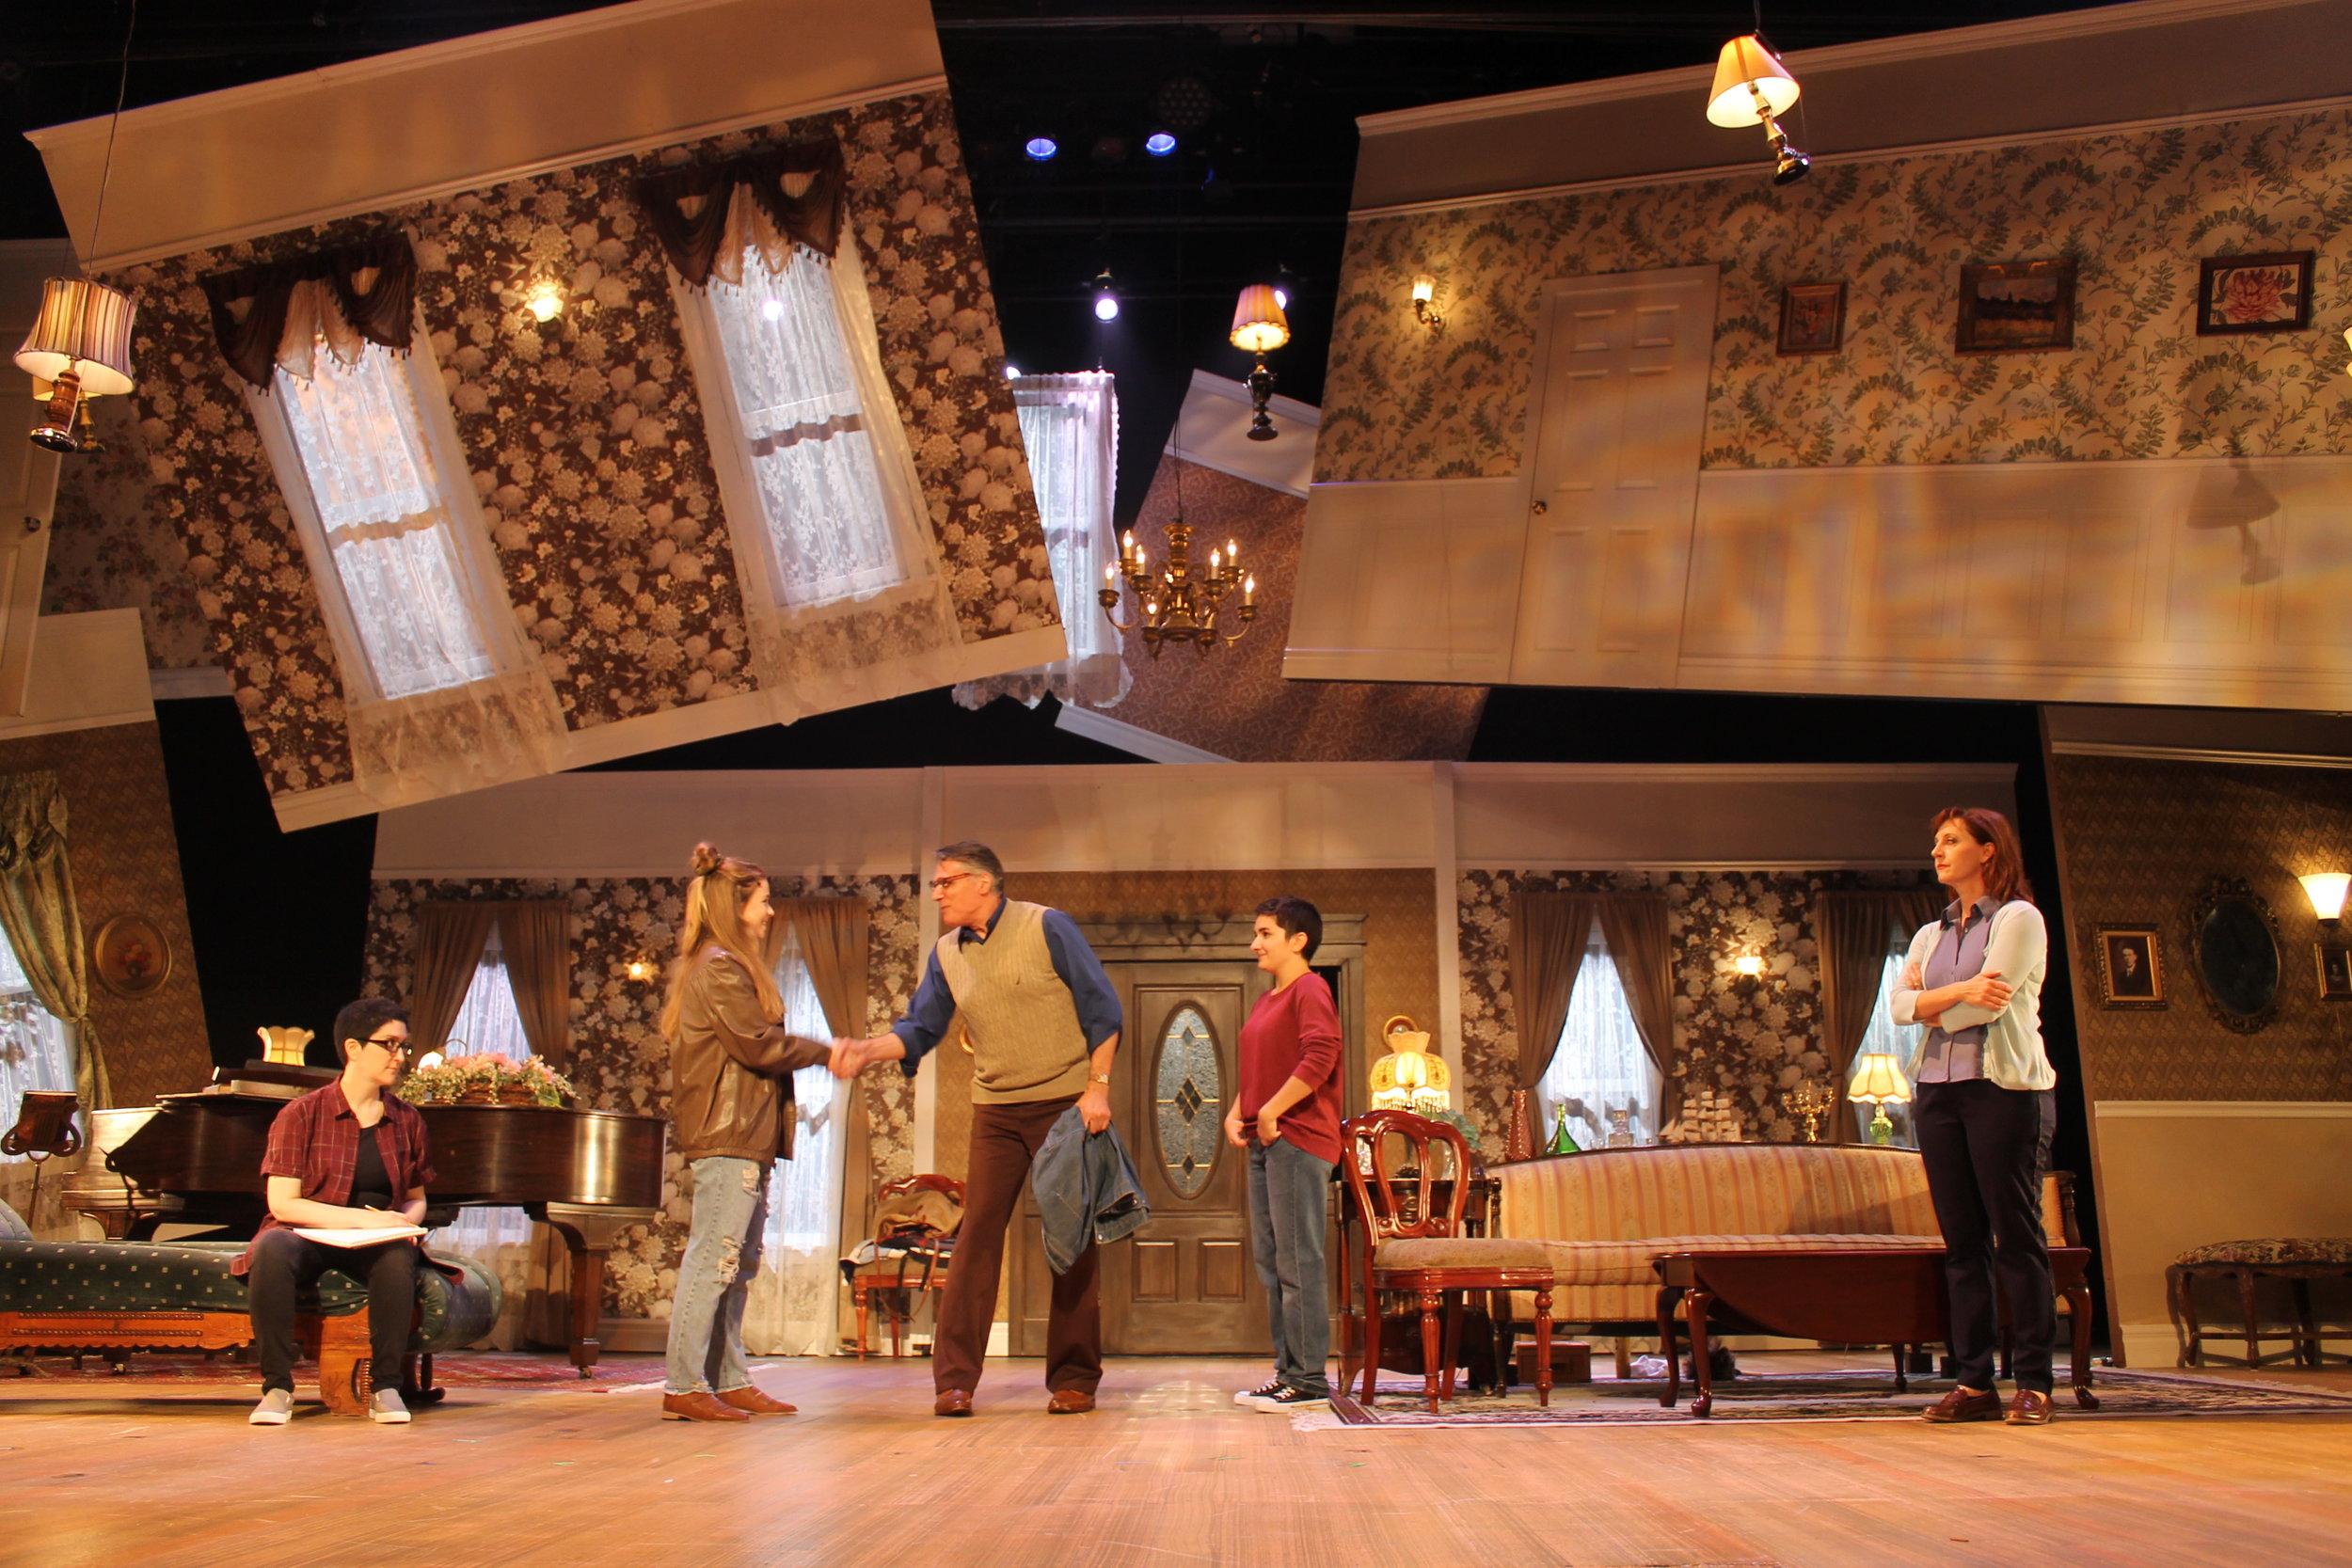 Fun Home,  White Plains Performing Arts Center, 2018. Dir. Amy Griffin, starring Robert Cuccioli, Lauren Cohn and Rita Harvey.